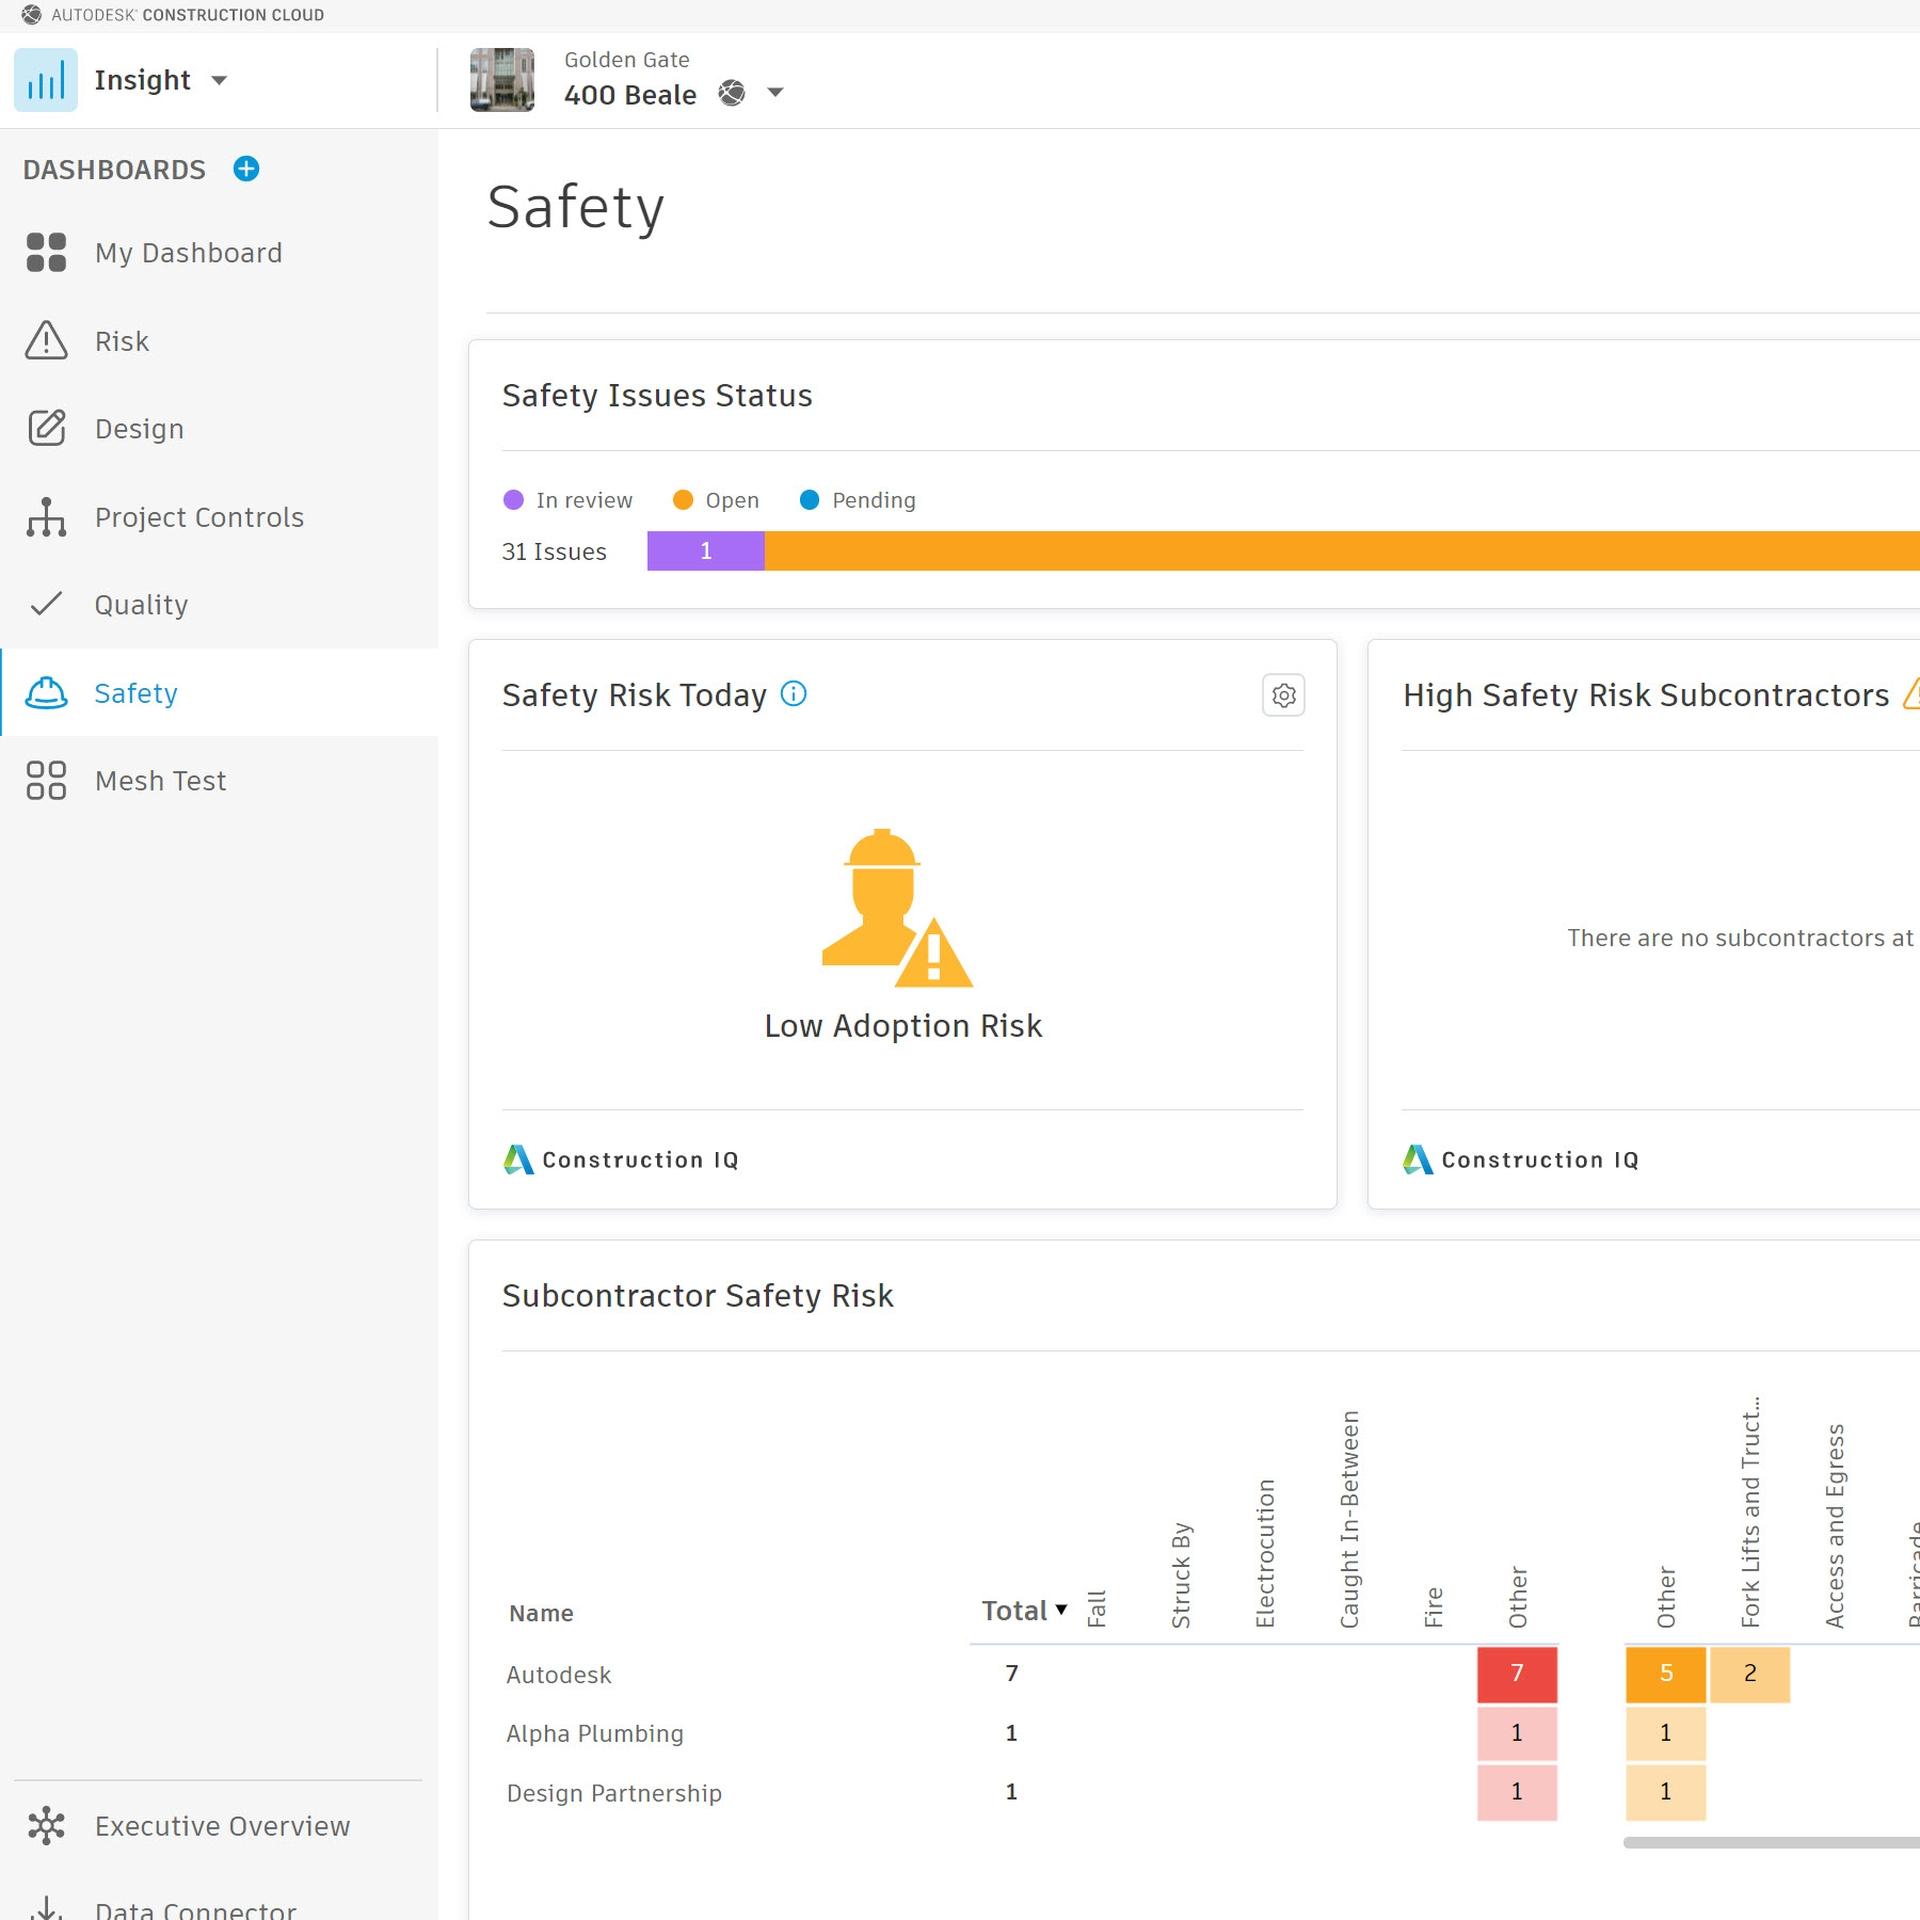 Construction Technology Data Analytics